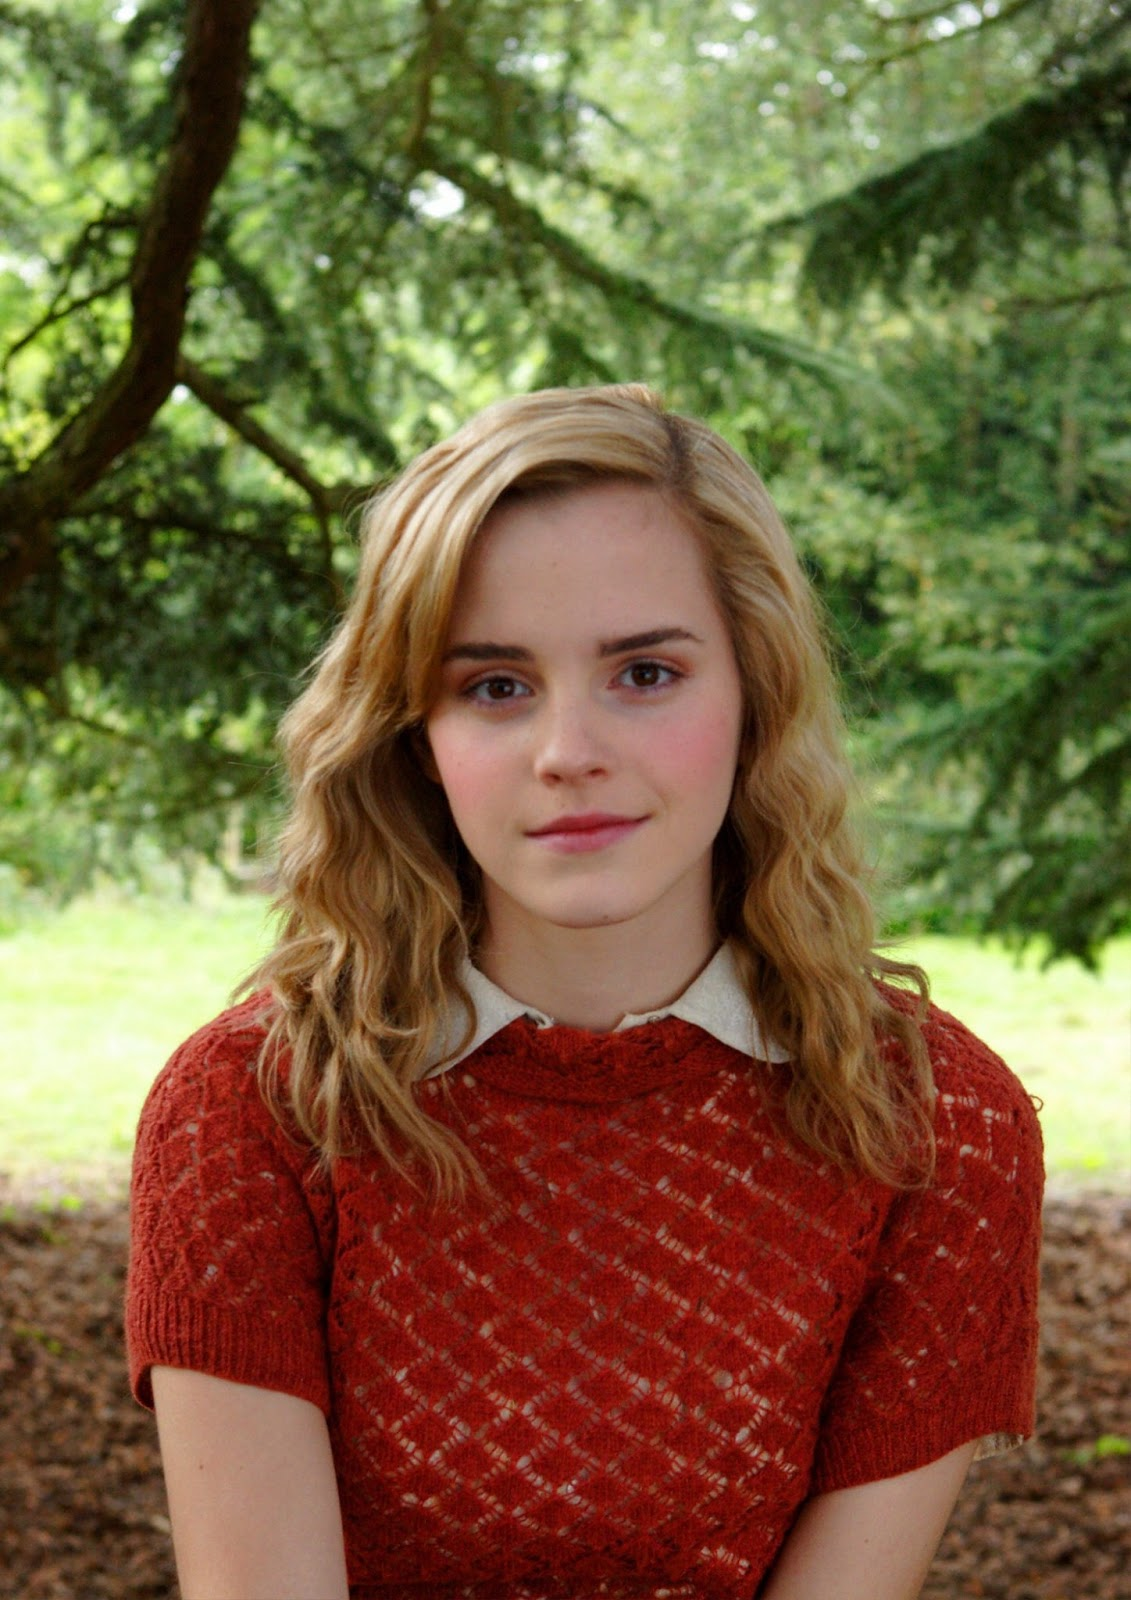 Emma Watson Hollywood Actress 40 Fantastic Photos: Famous English Actress Emma Watson Cute Picture Gallery